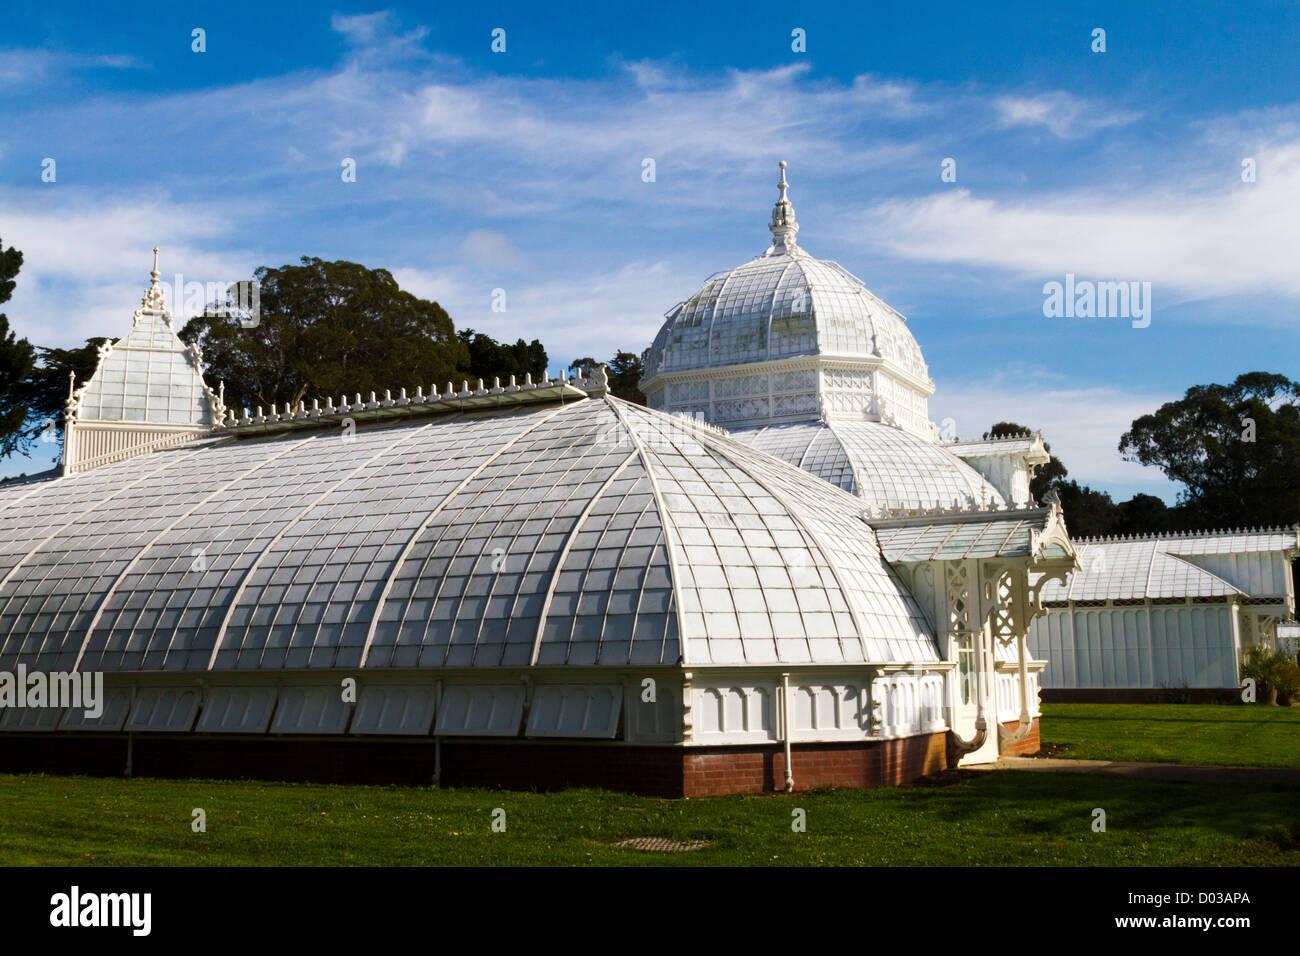 Strybing Arboretum At The San Francisco Botanical Garden In Golden Gate  Park In San Francisco California